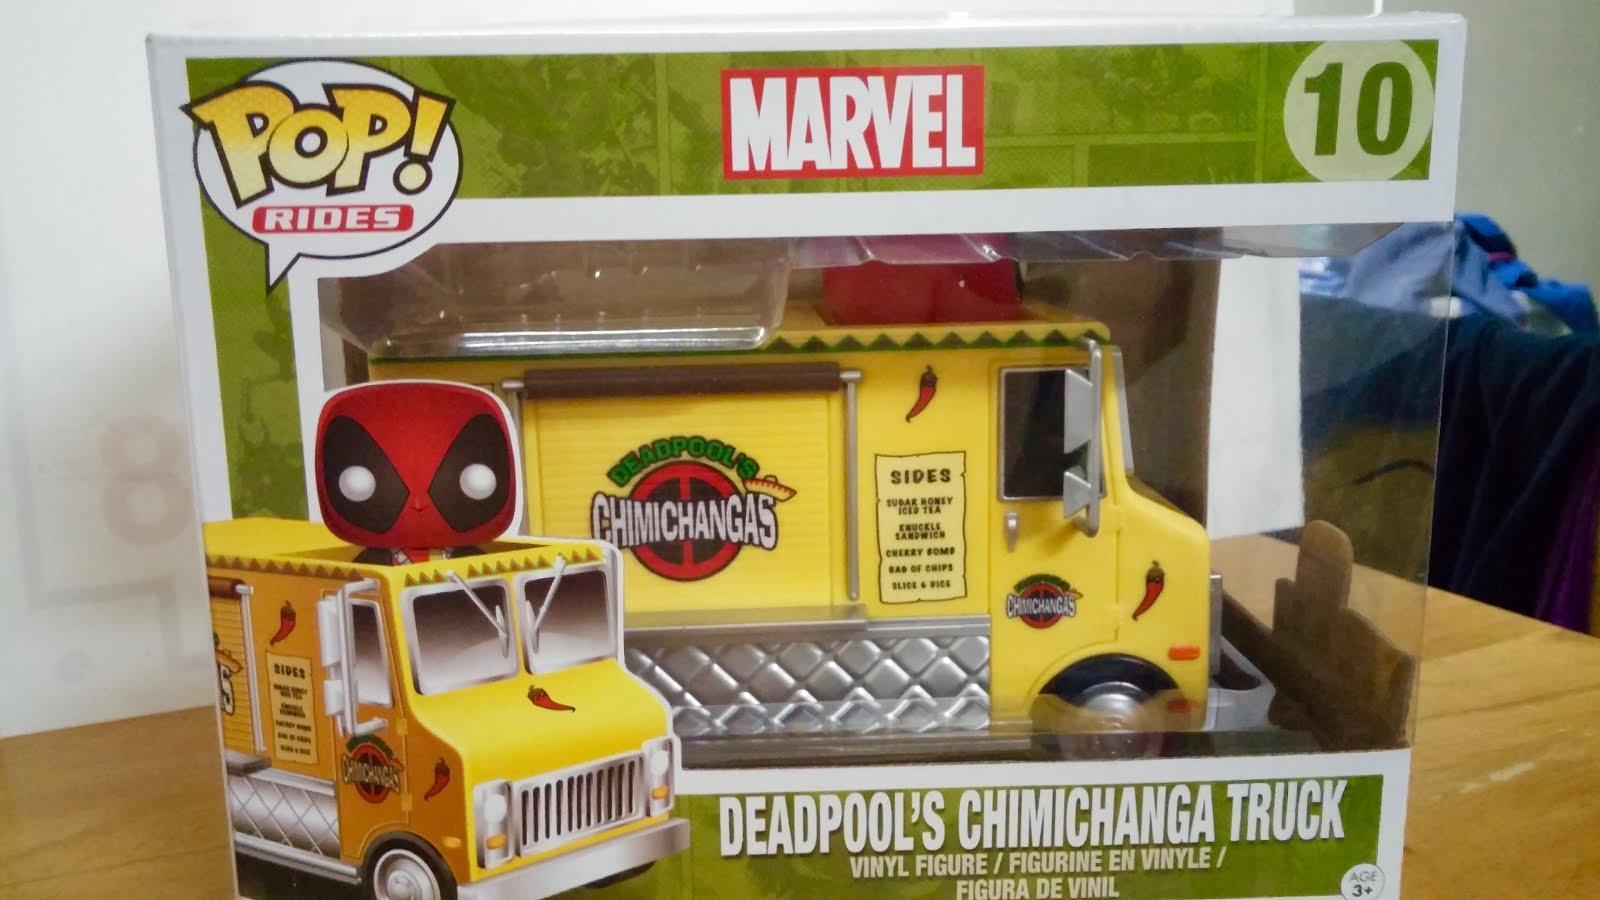 Thebackingboardfiles Got Me A Deadpool Chimichanga Truck Pop